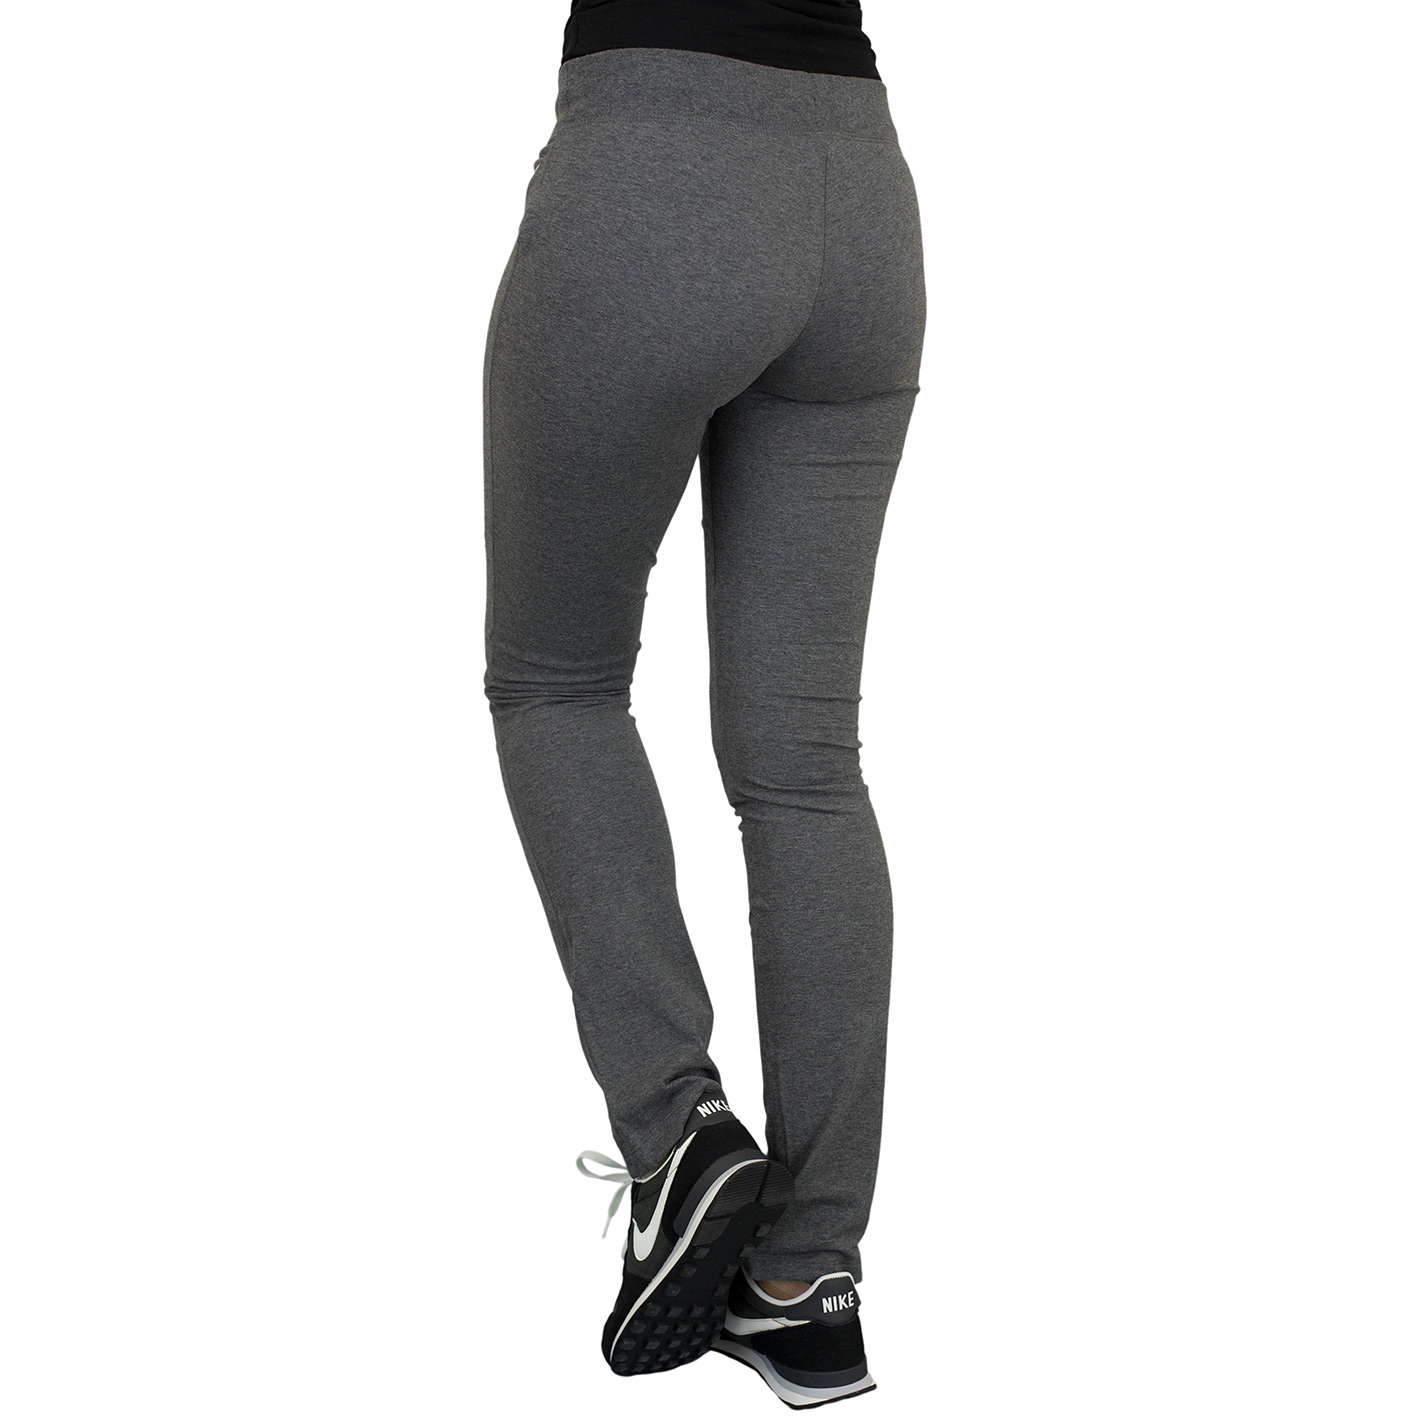 ☆ Nike Damen Sweatpants OH Jersey dunkelgrauweiß hier